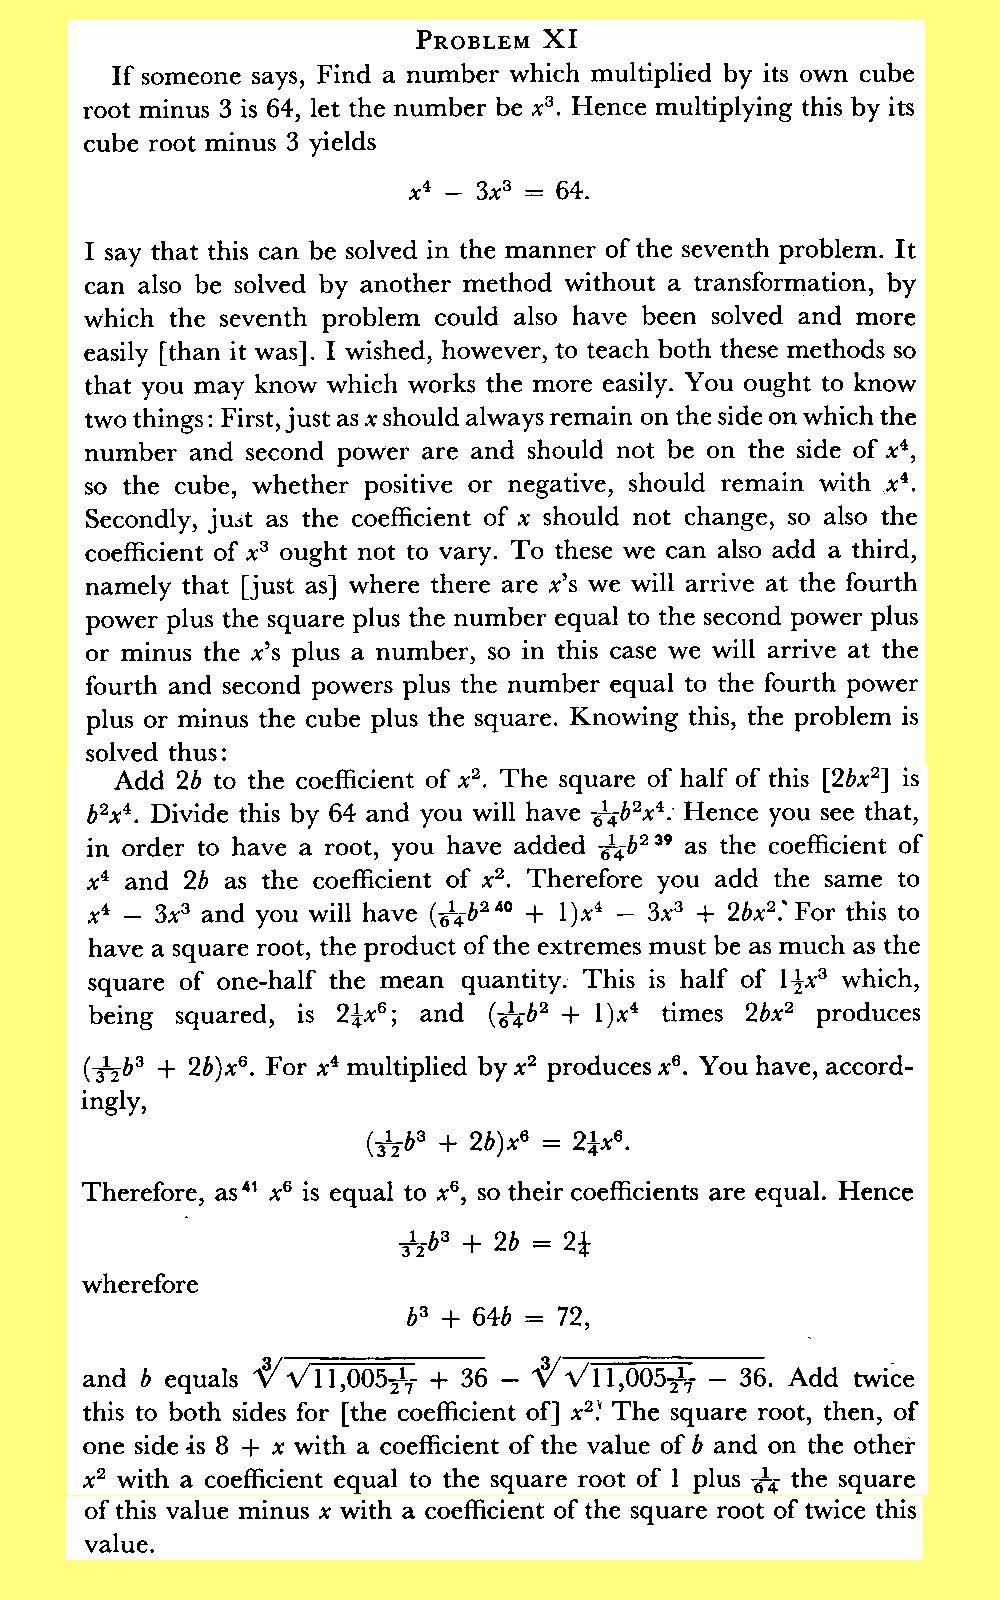 Chapter 39, Problem Xi